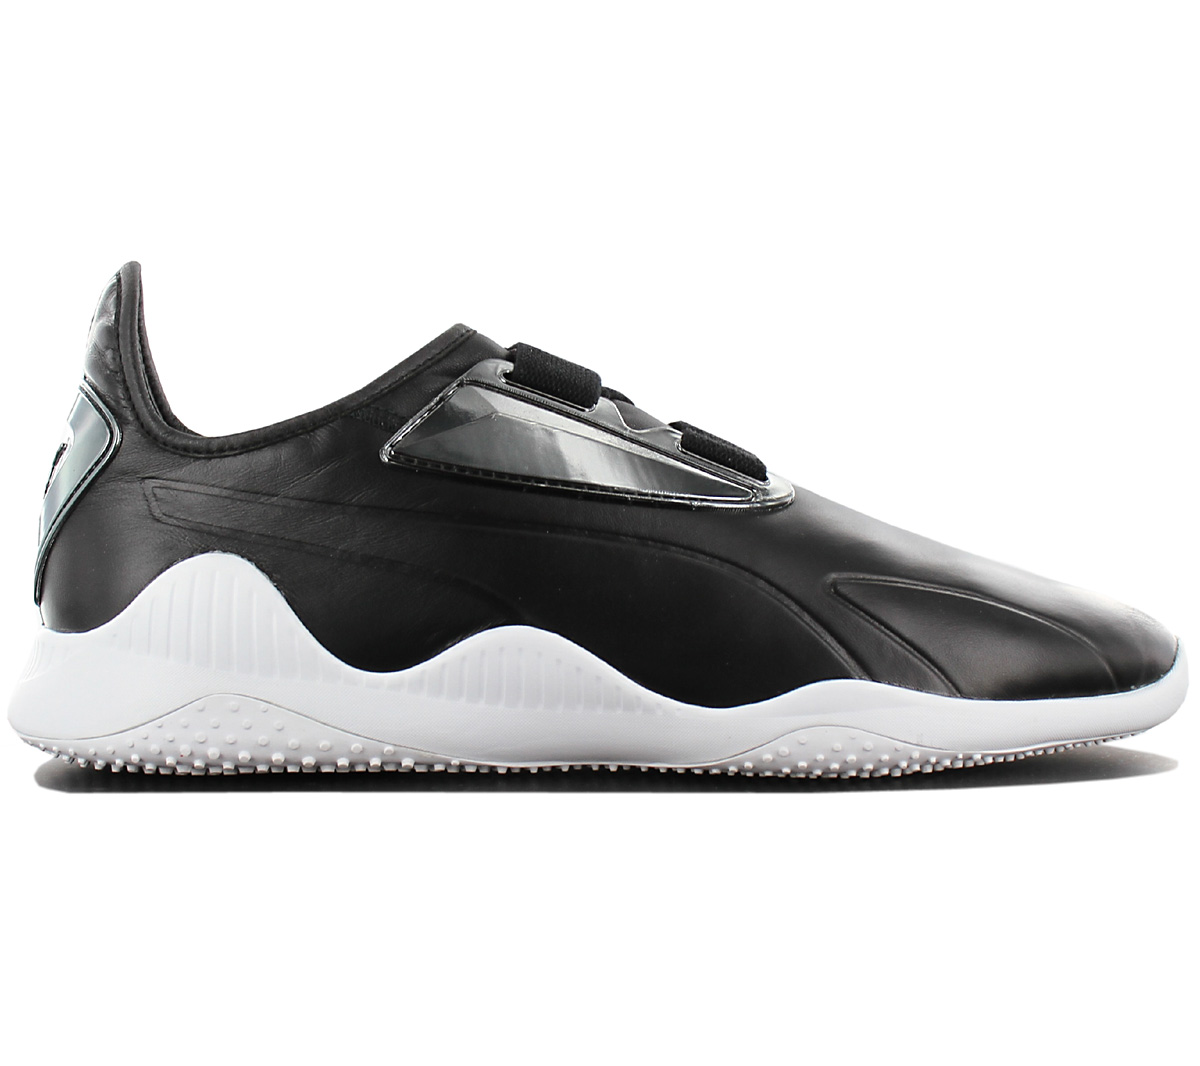 meilleur service 7ab4a b2666 Details about Puma Mostro Milano Mln Leather Men's Sneaker Shoes Leather  Black 363449-01 New